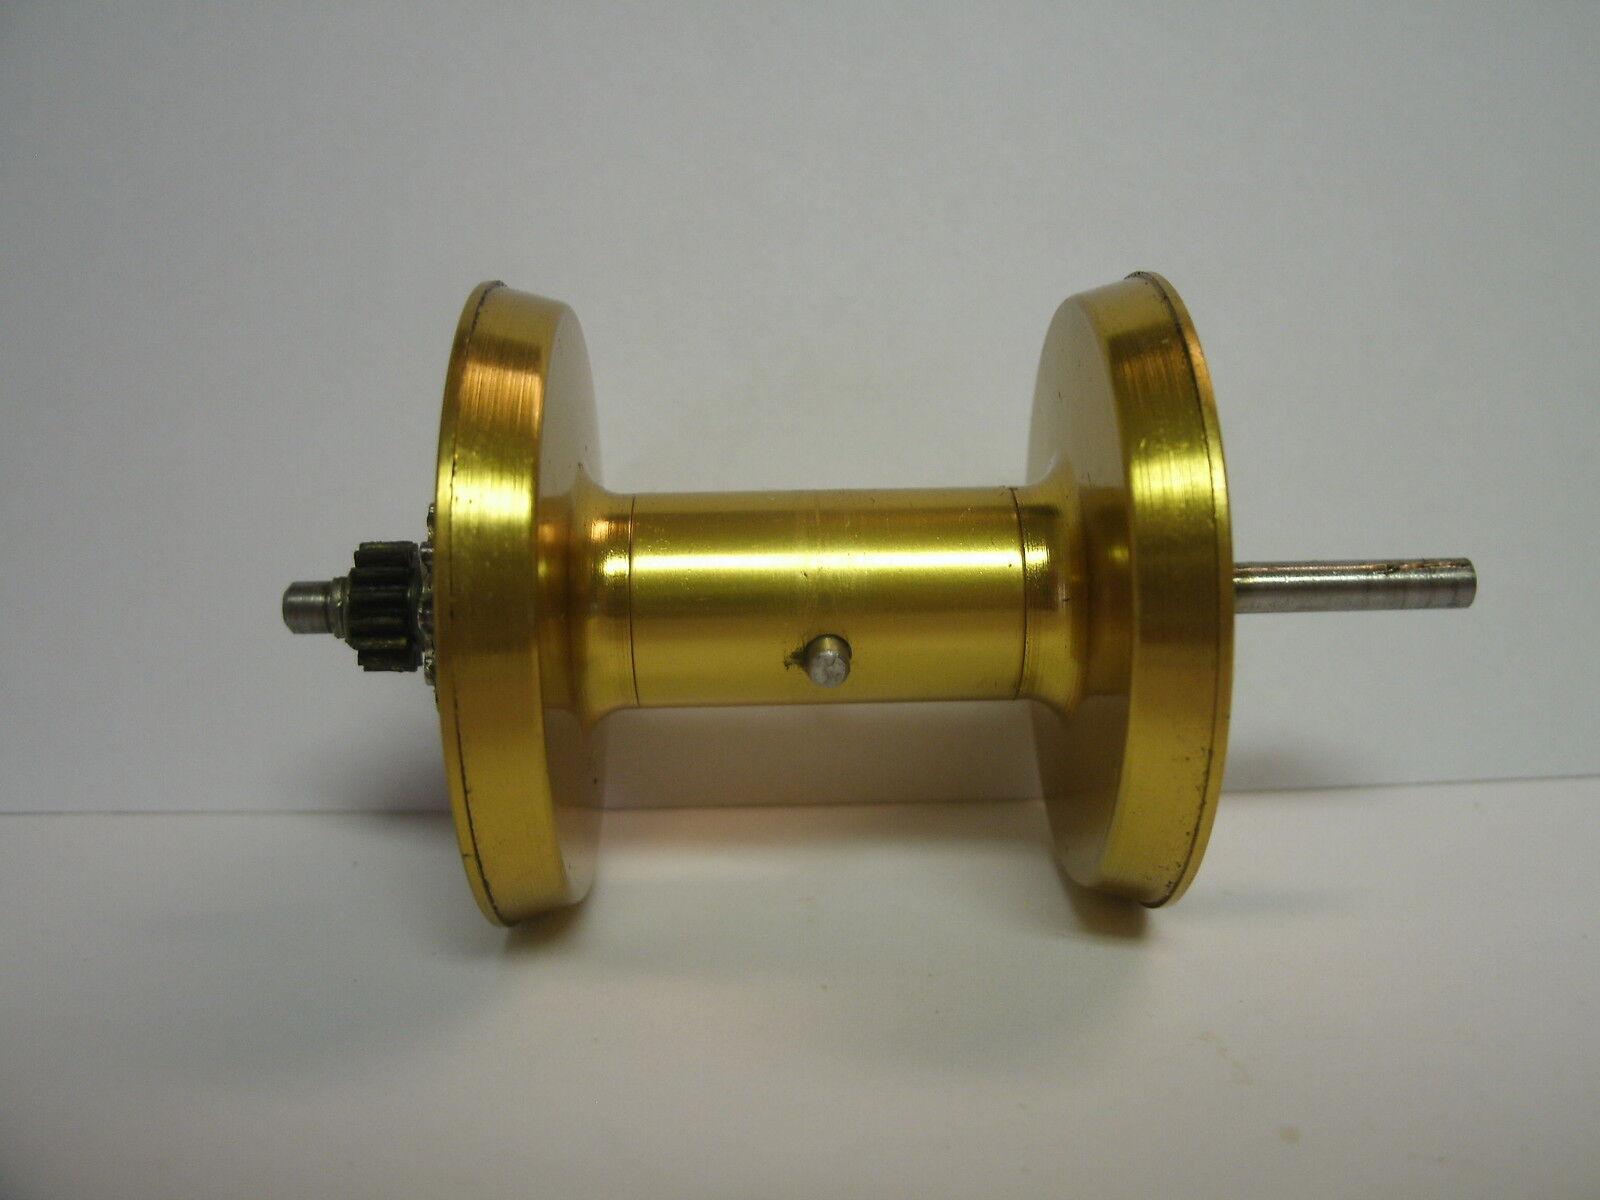 USED PENN BAITCASTING REEL PART - 910 Levelmatic - Spool Assembly